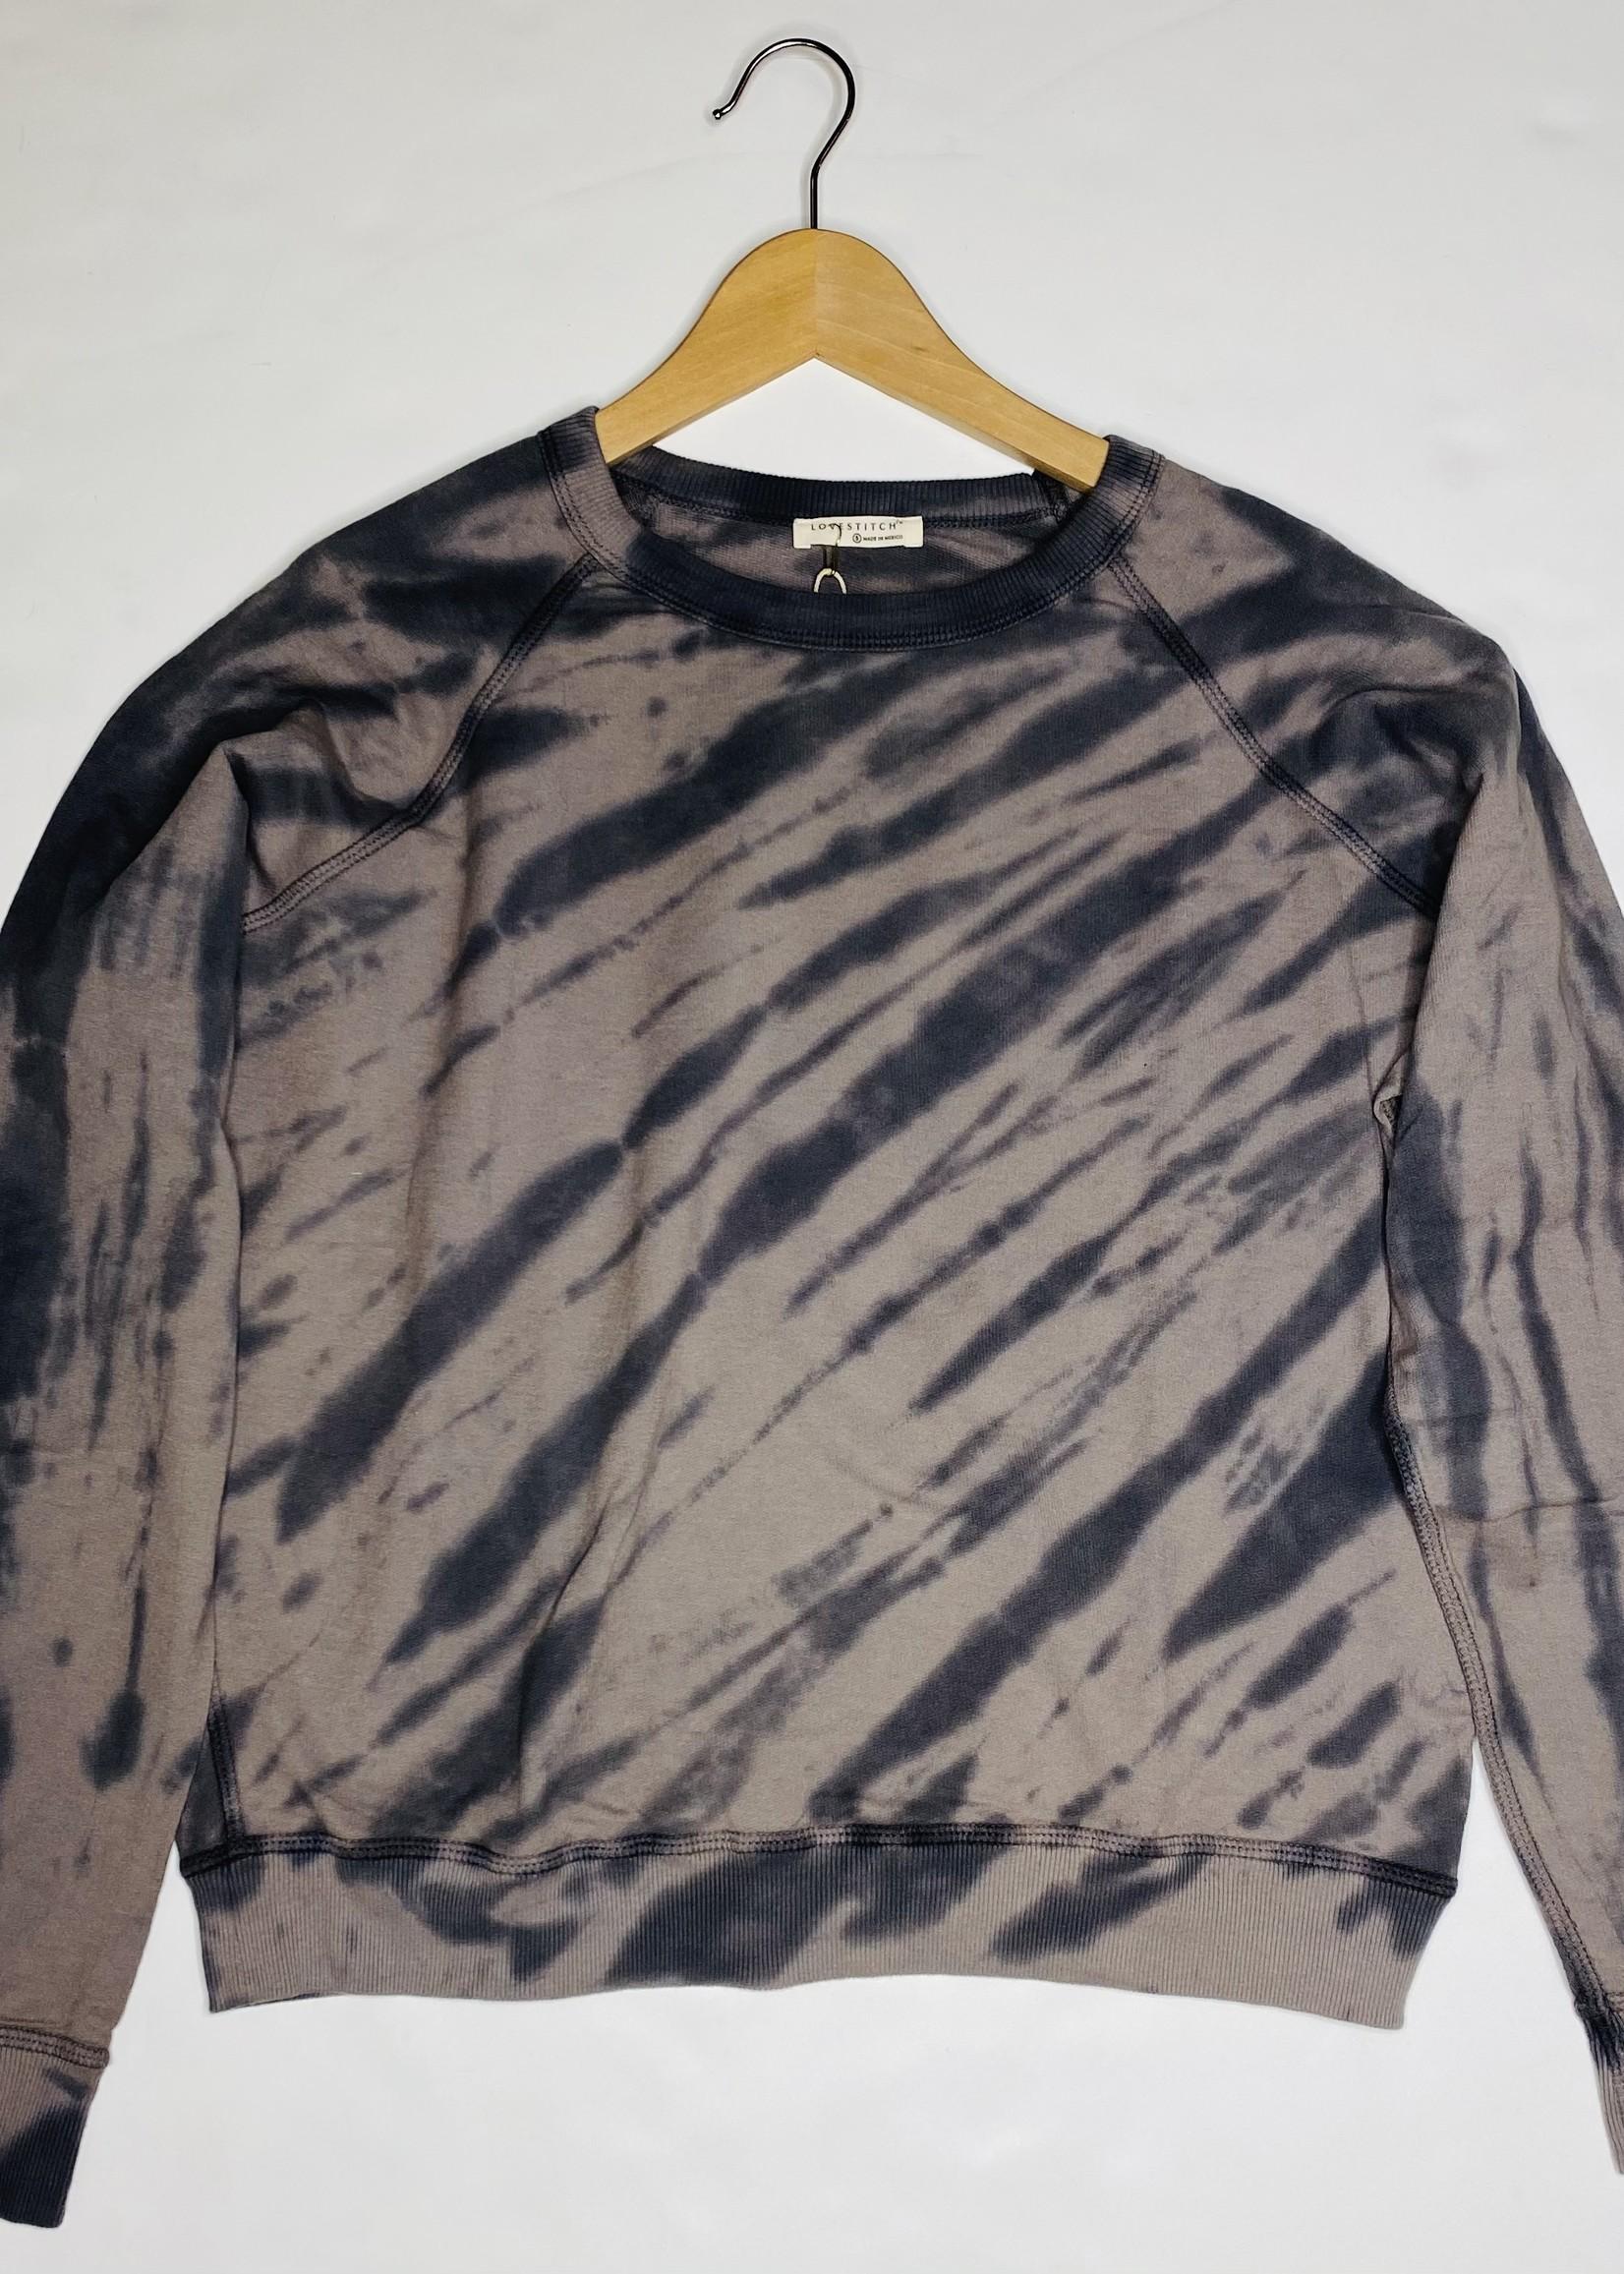 Zebra Tie Dye Sweatshirt